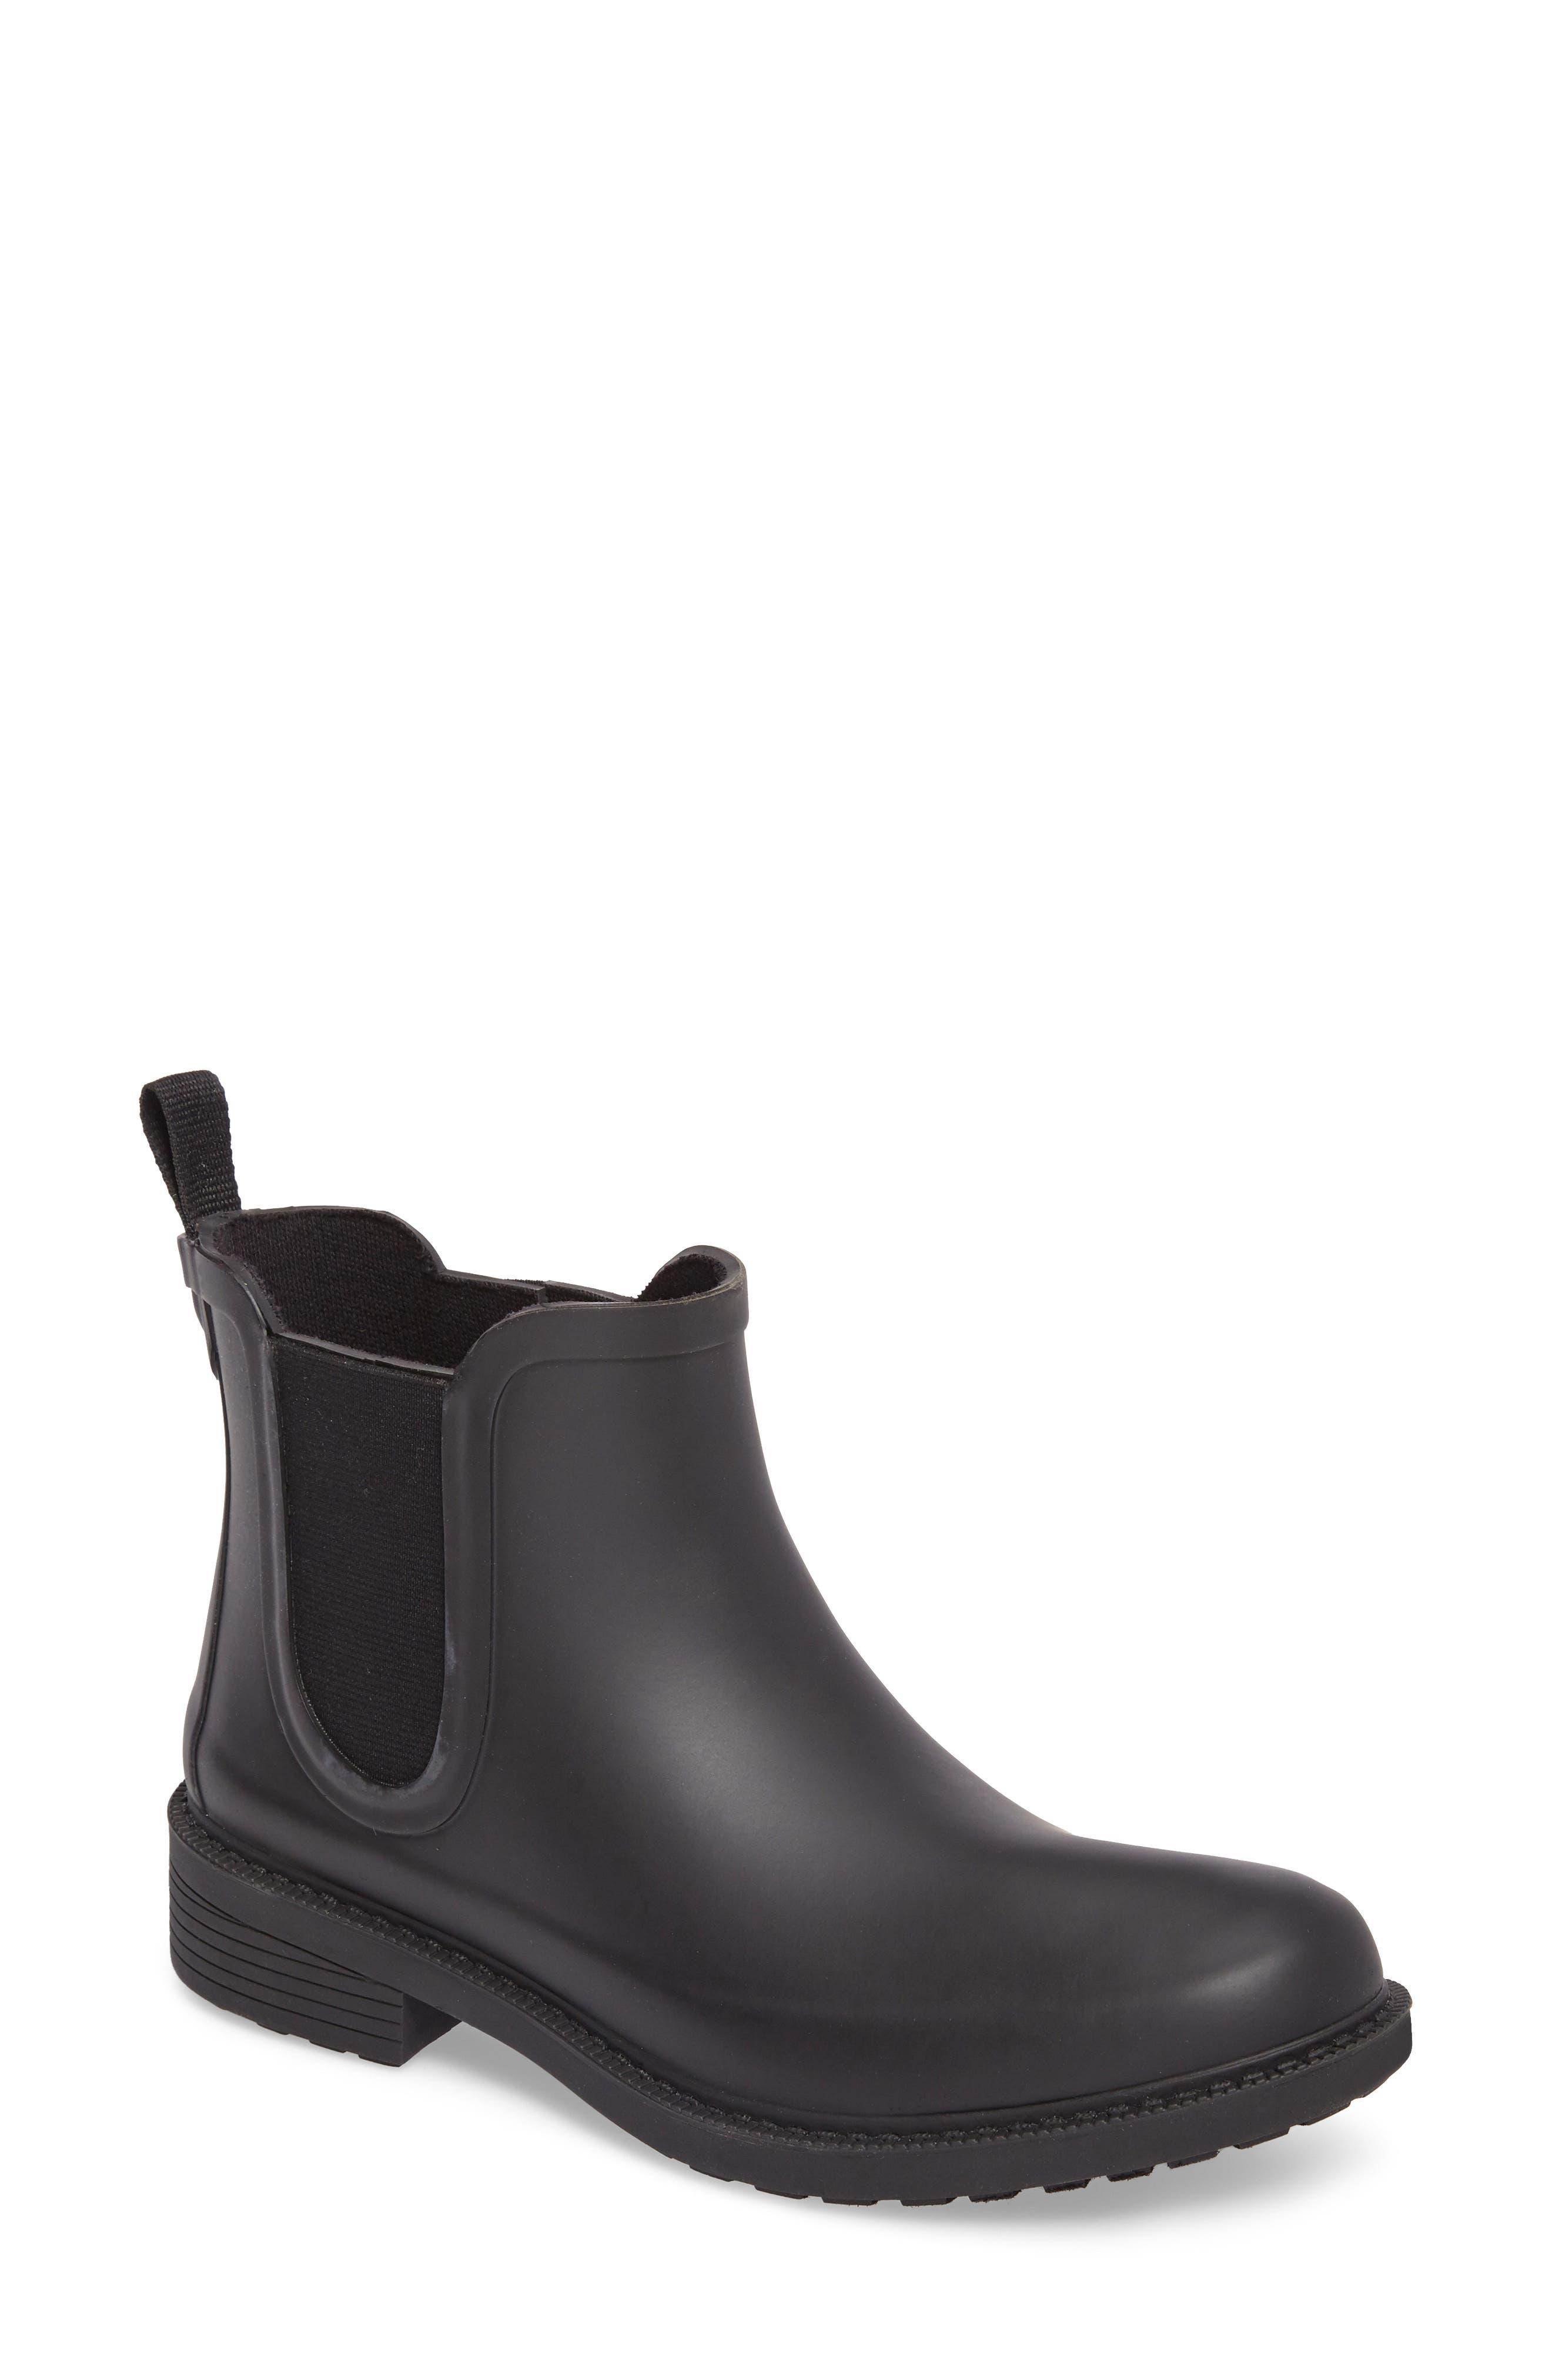 Alternate Image 1 Selected - Madewell The Chelsea Rain Boot (Women)